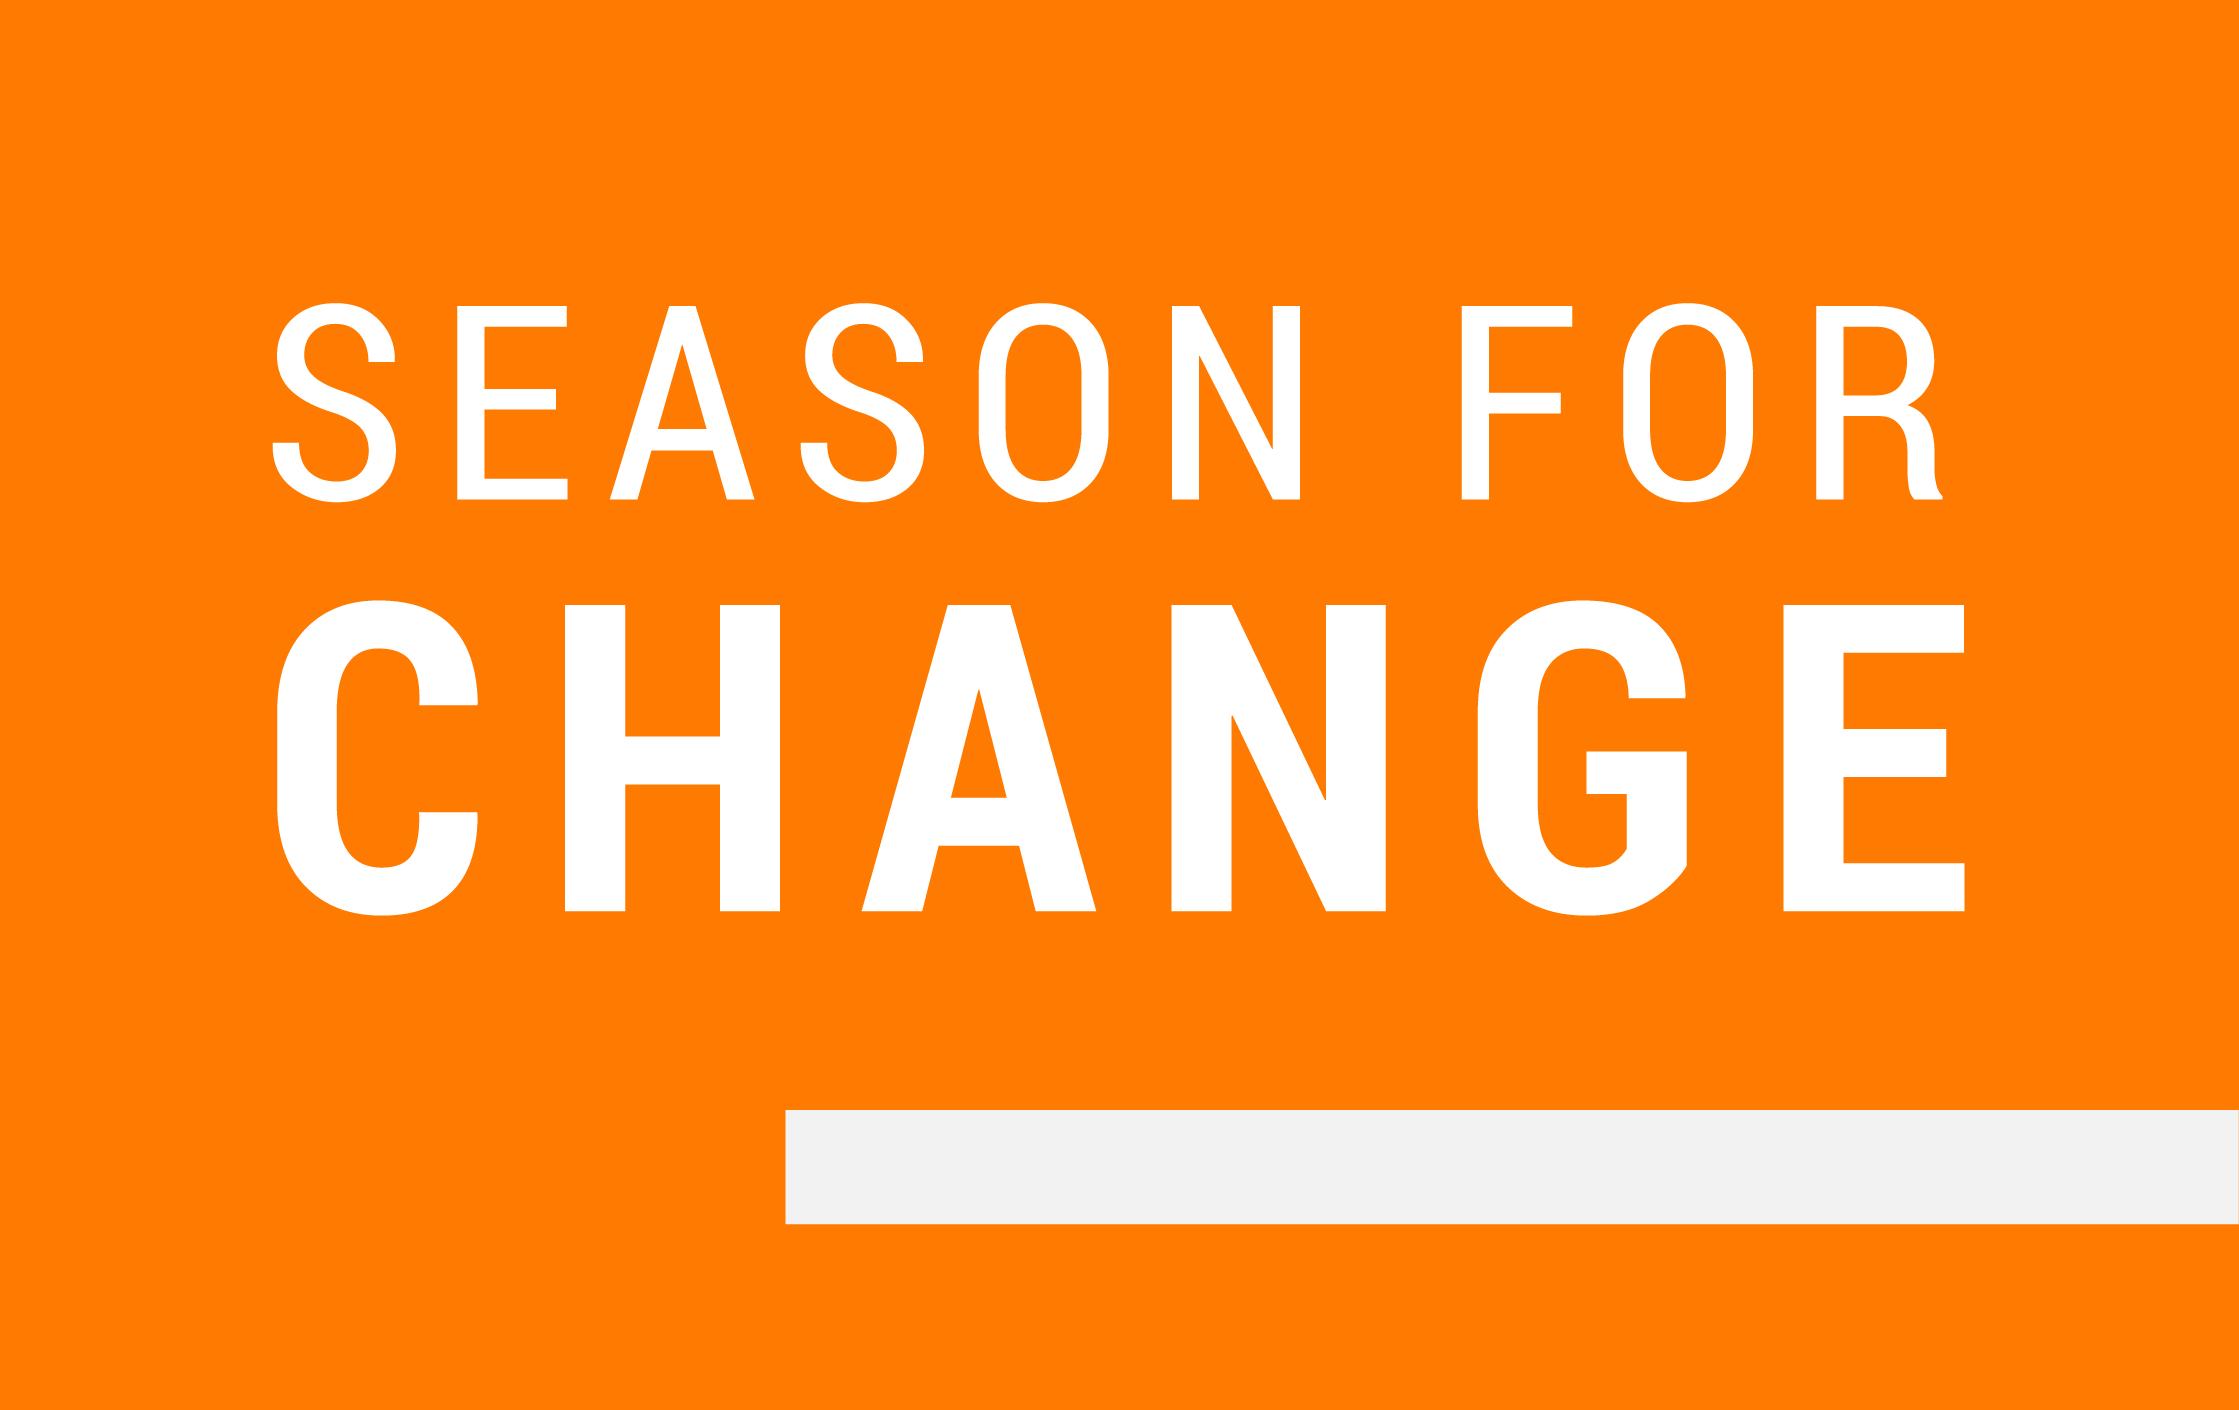 season for change